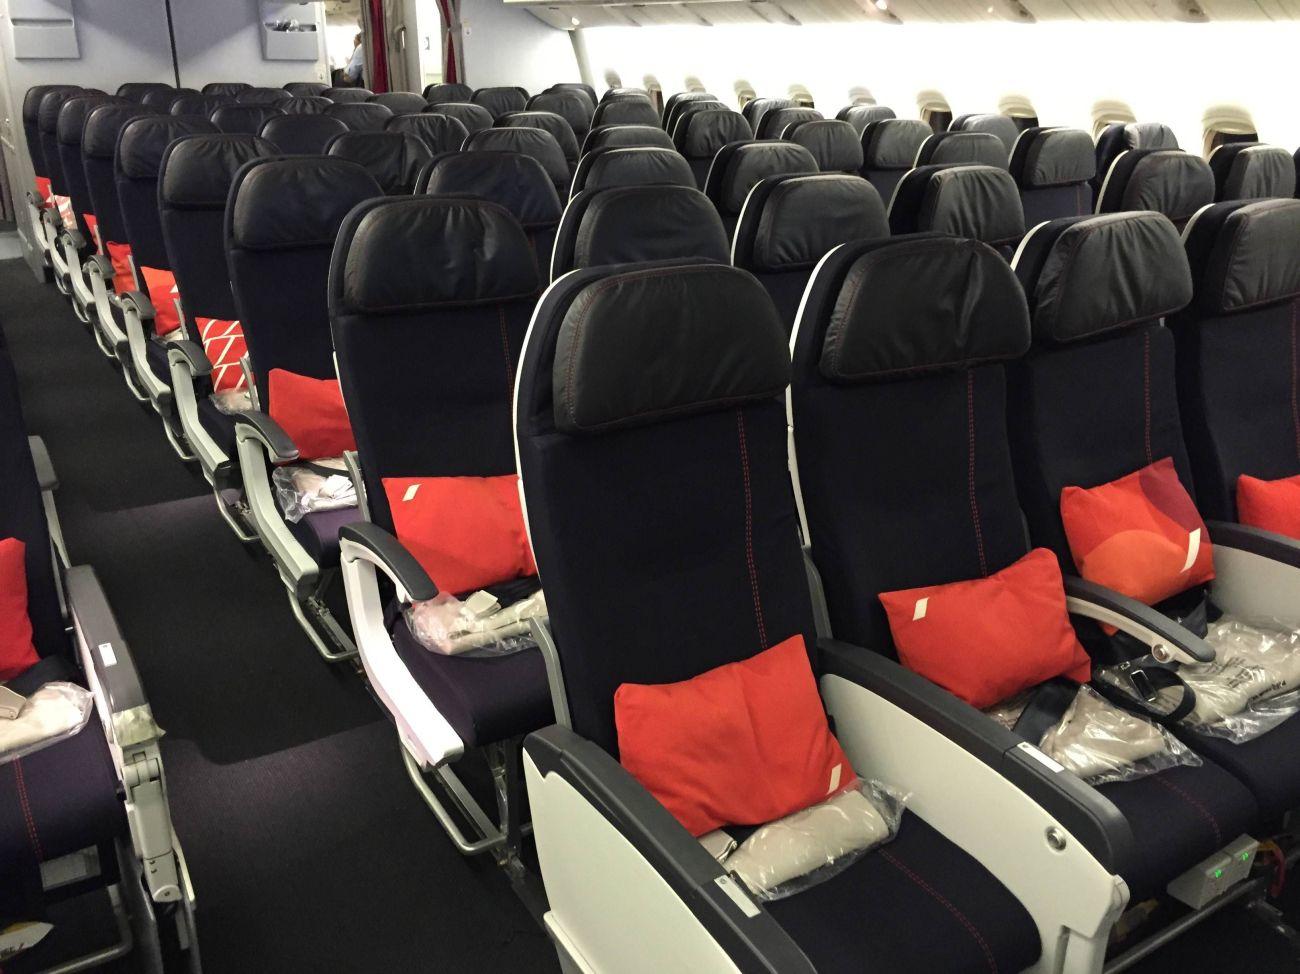 air france new business class nova classe executiva b777-200 passageirodeprimeira